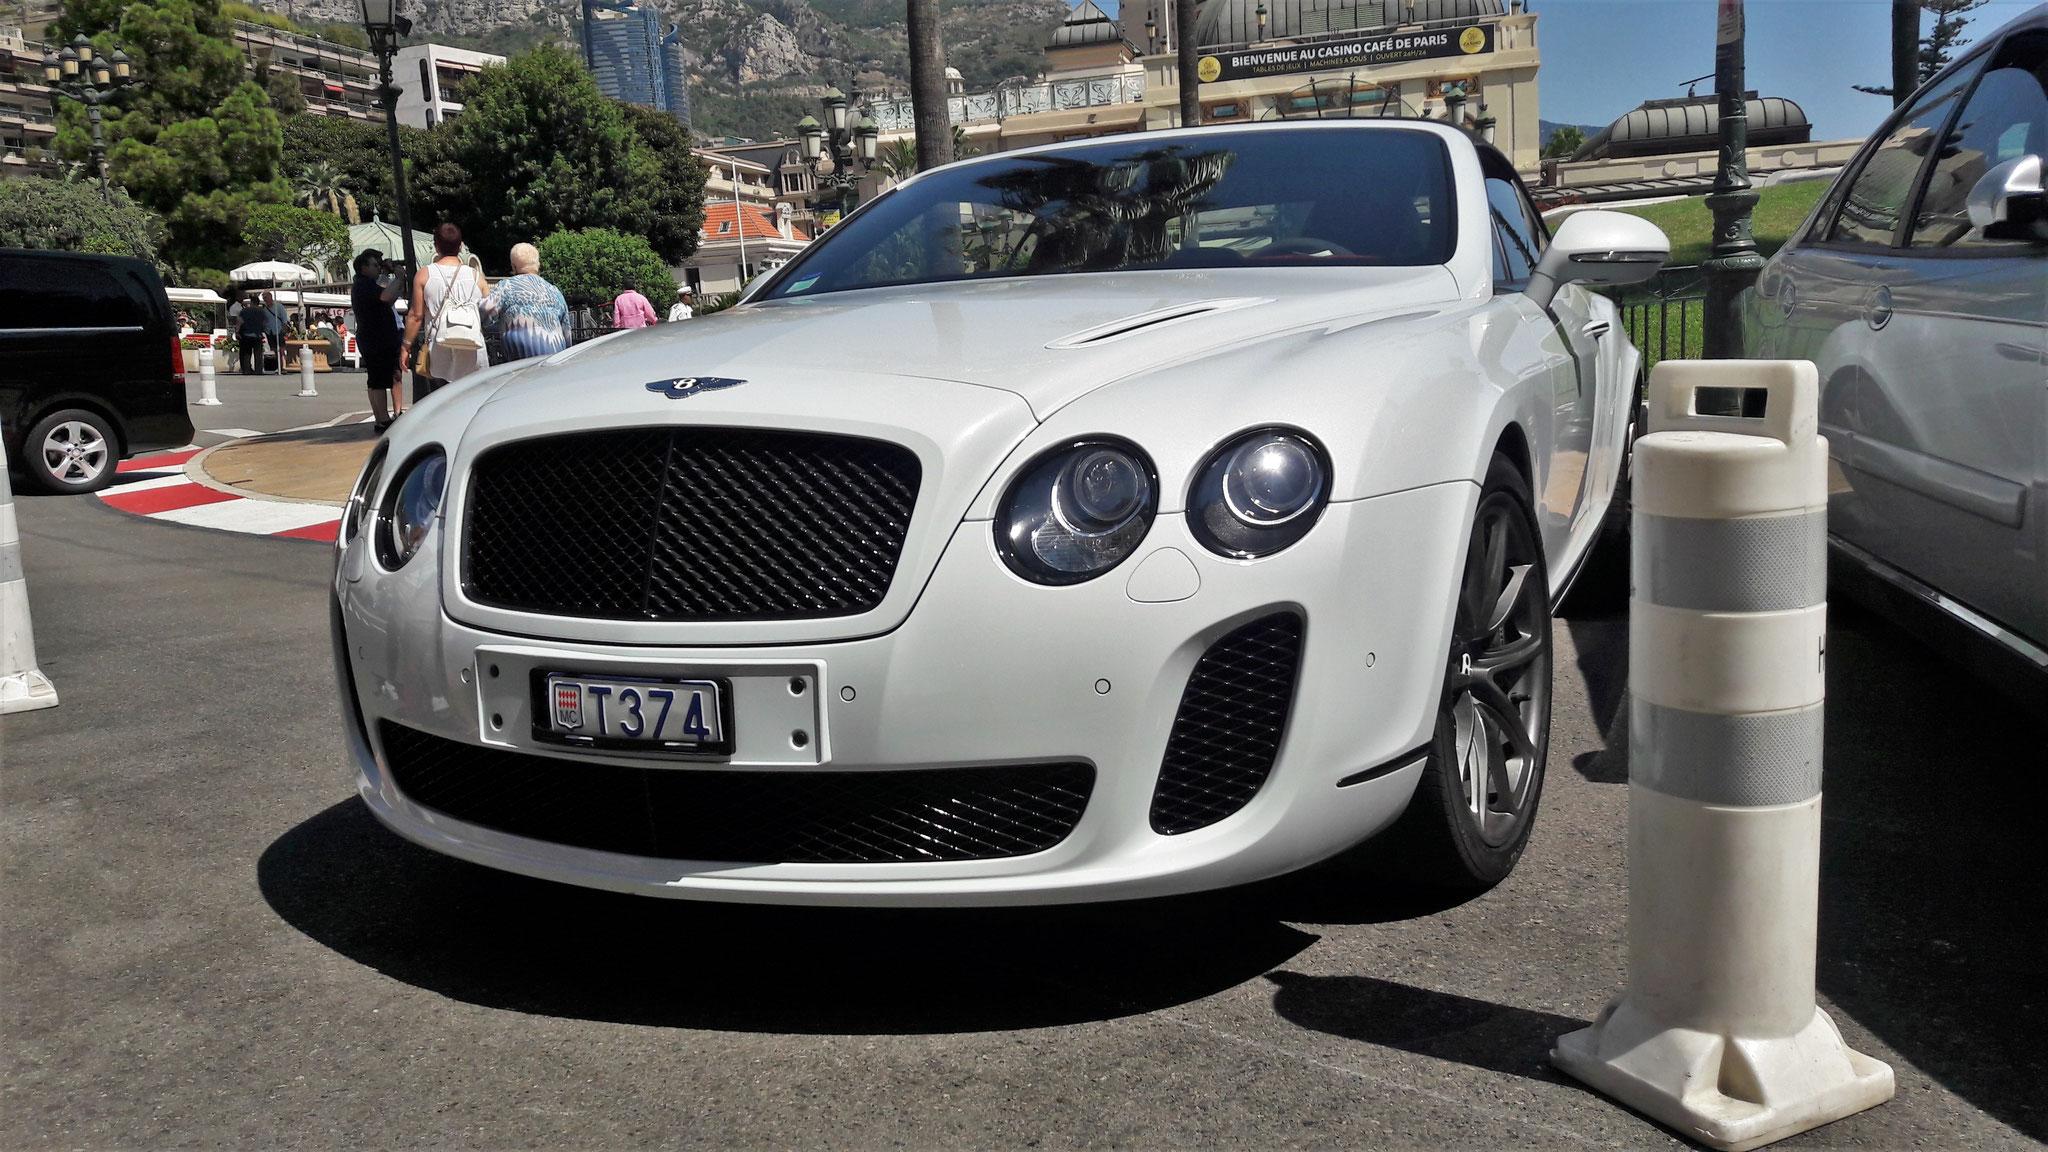 Bentley Continental GTC Supersports - T374 (MC)